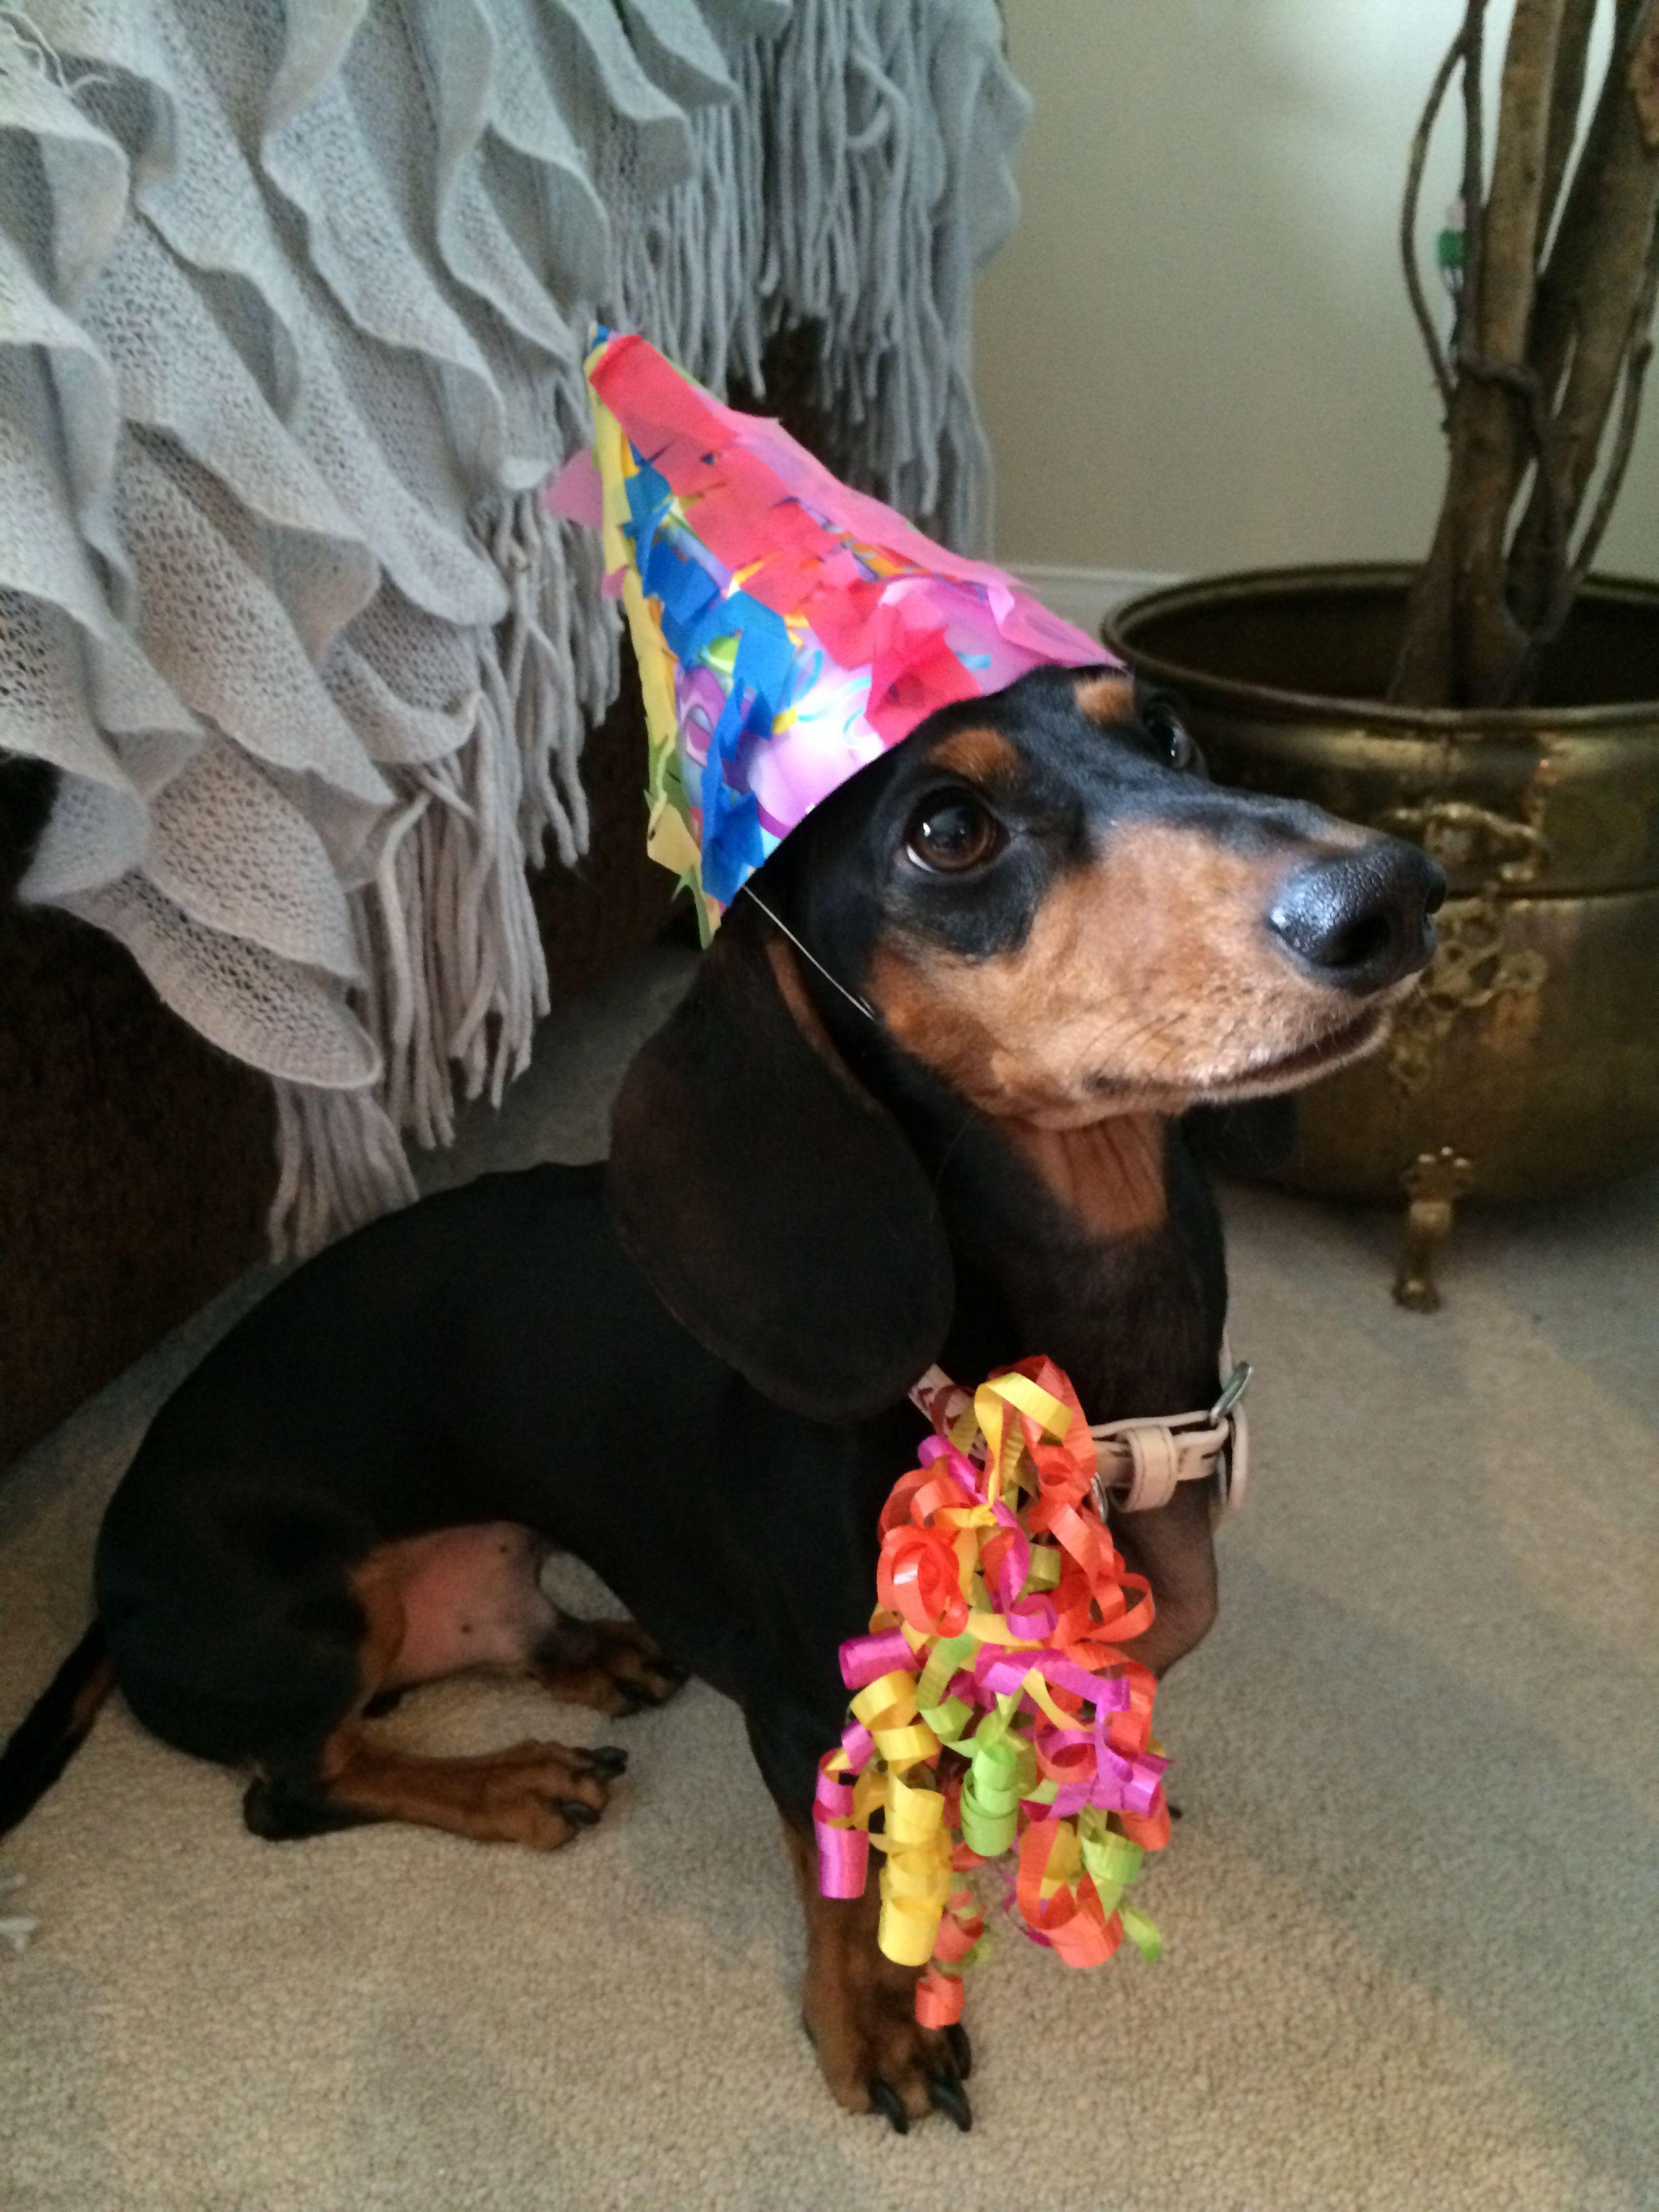 Cute dachshund ready to party weenie dogs weiner dog